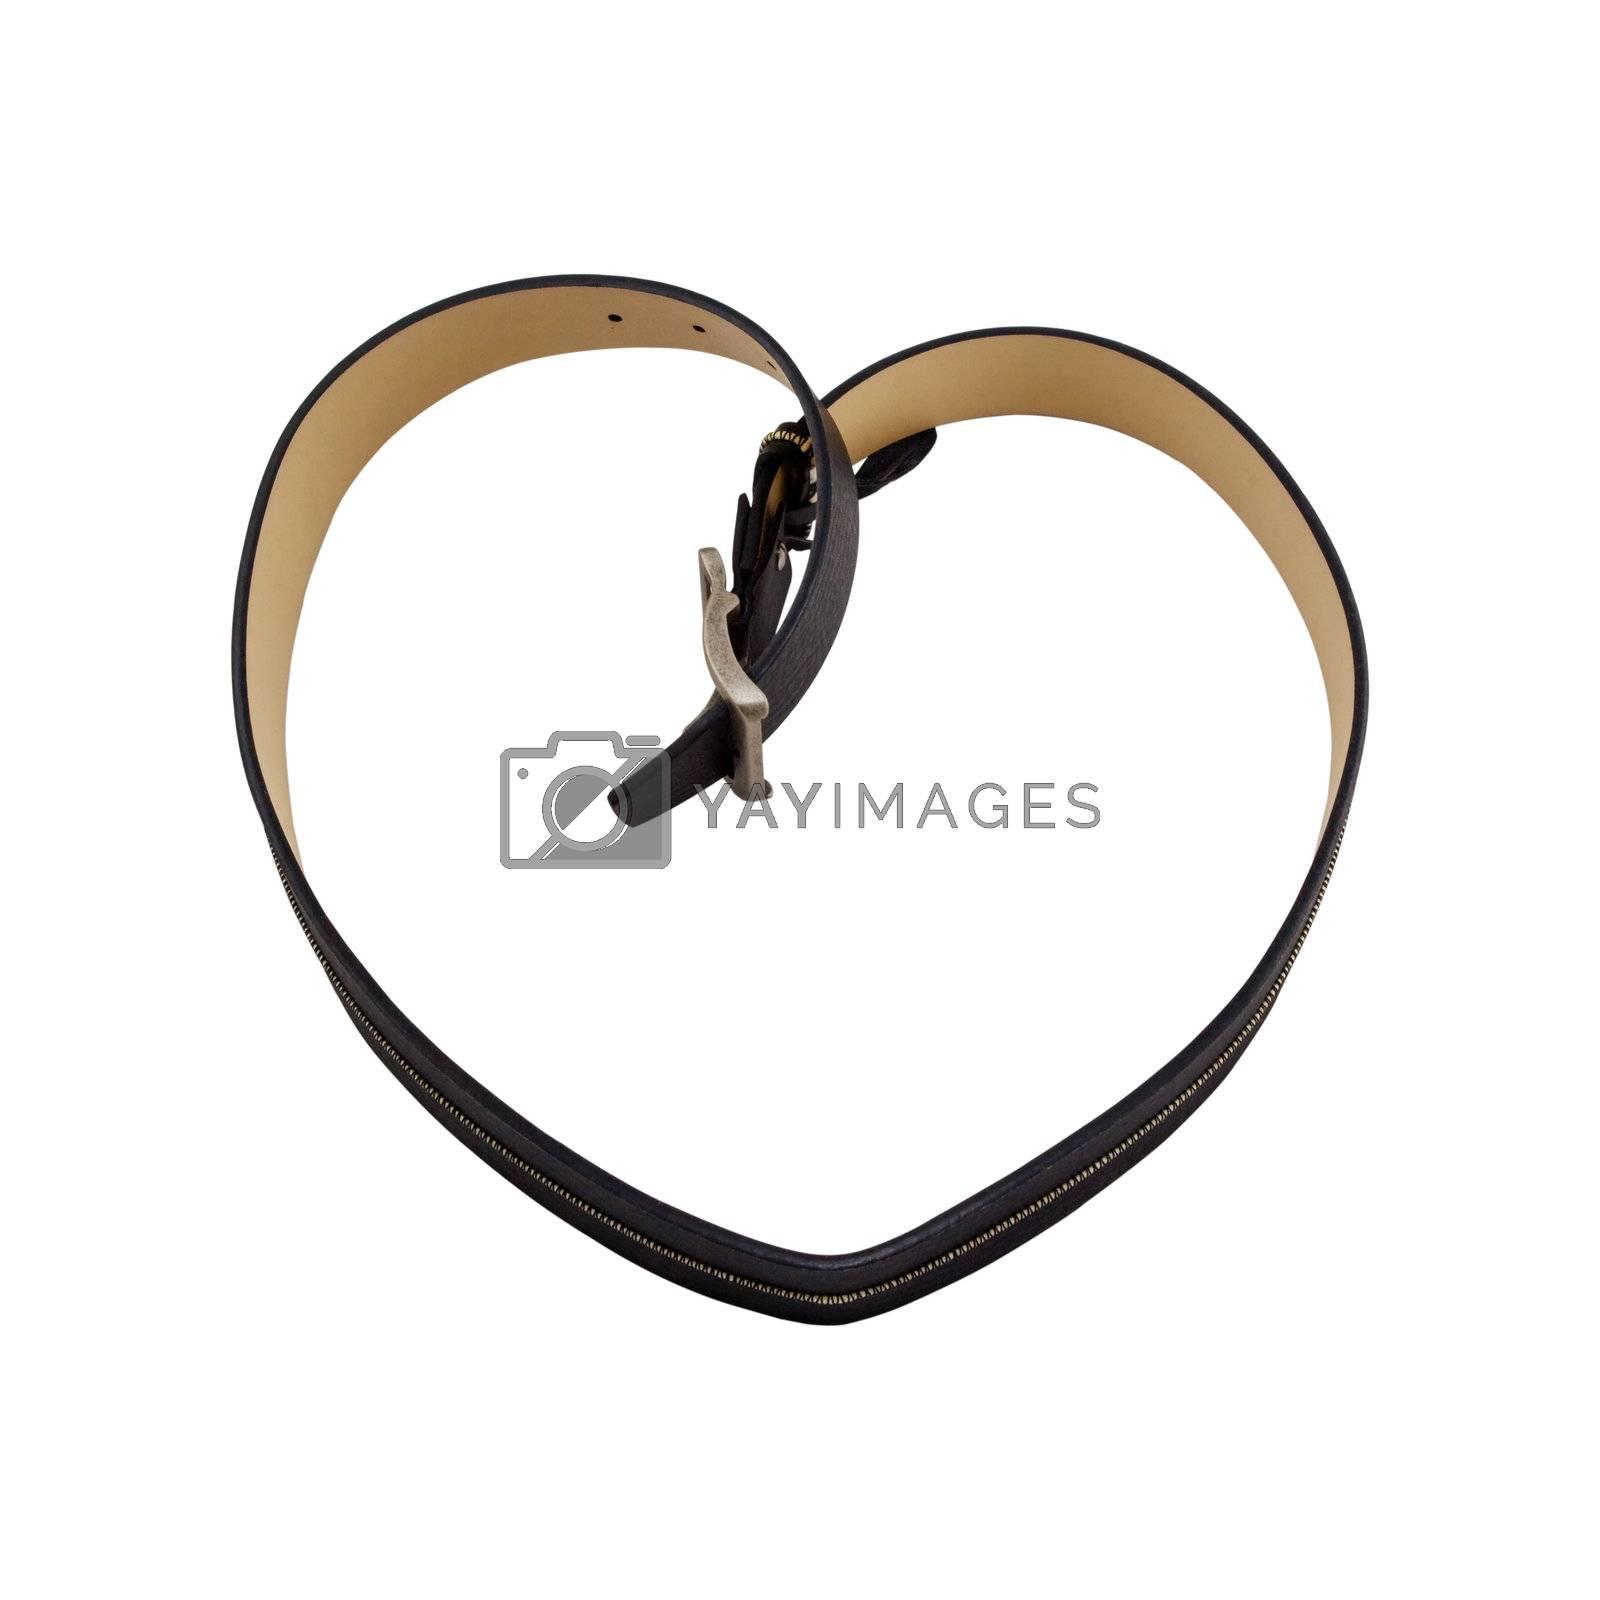 black heart belt isolated on the white background